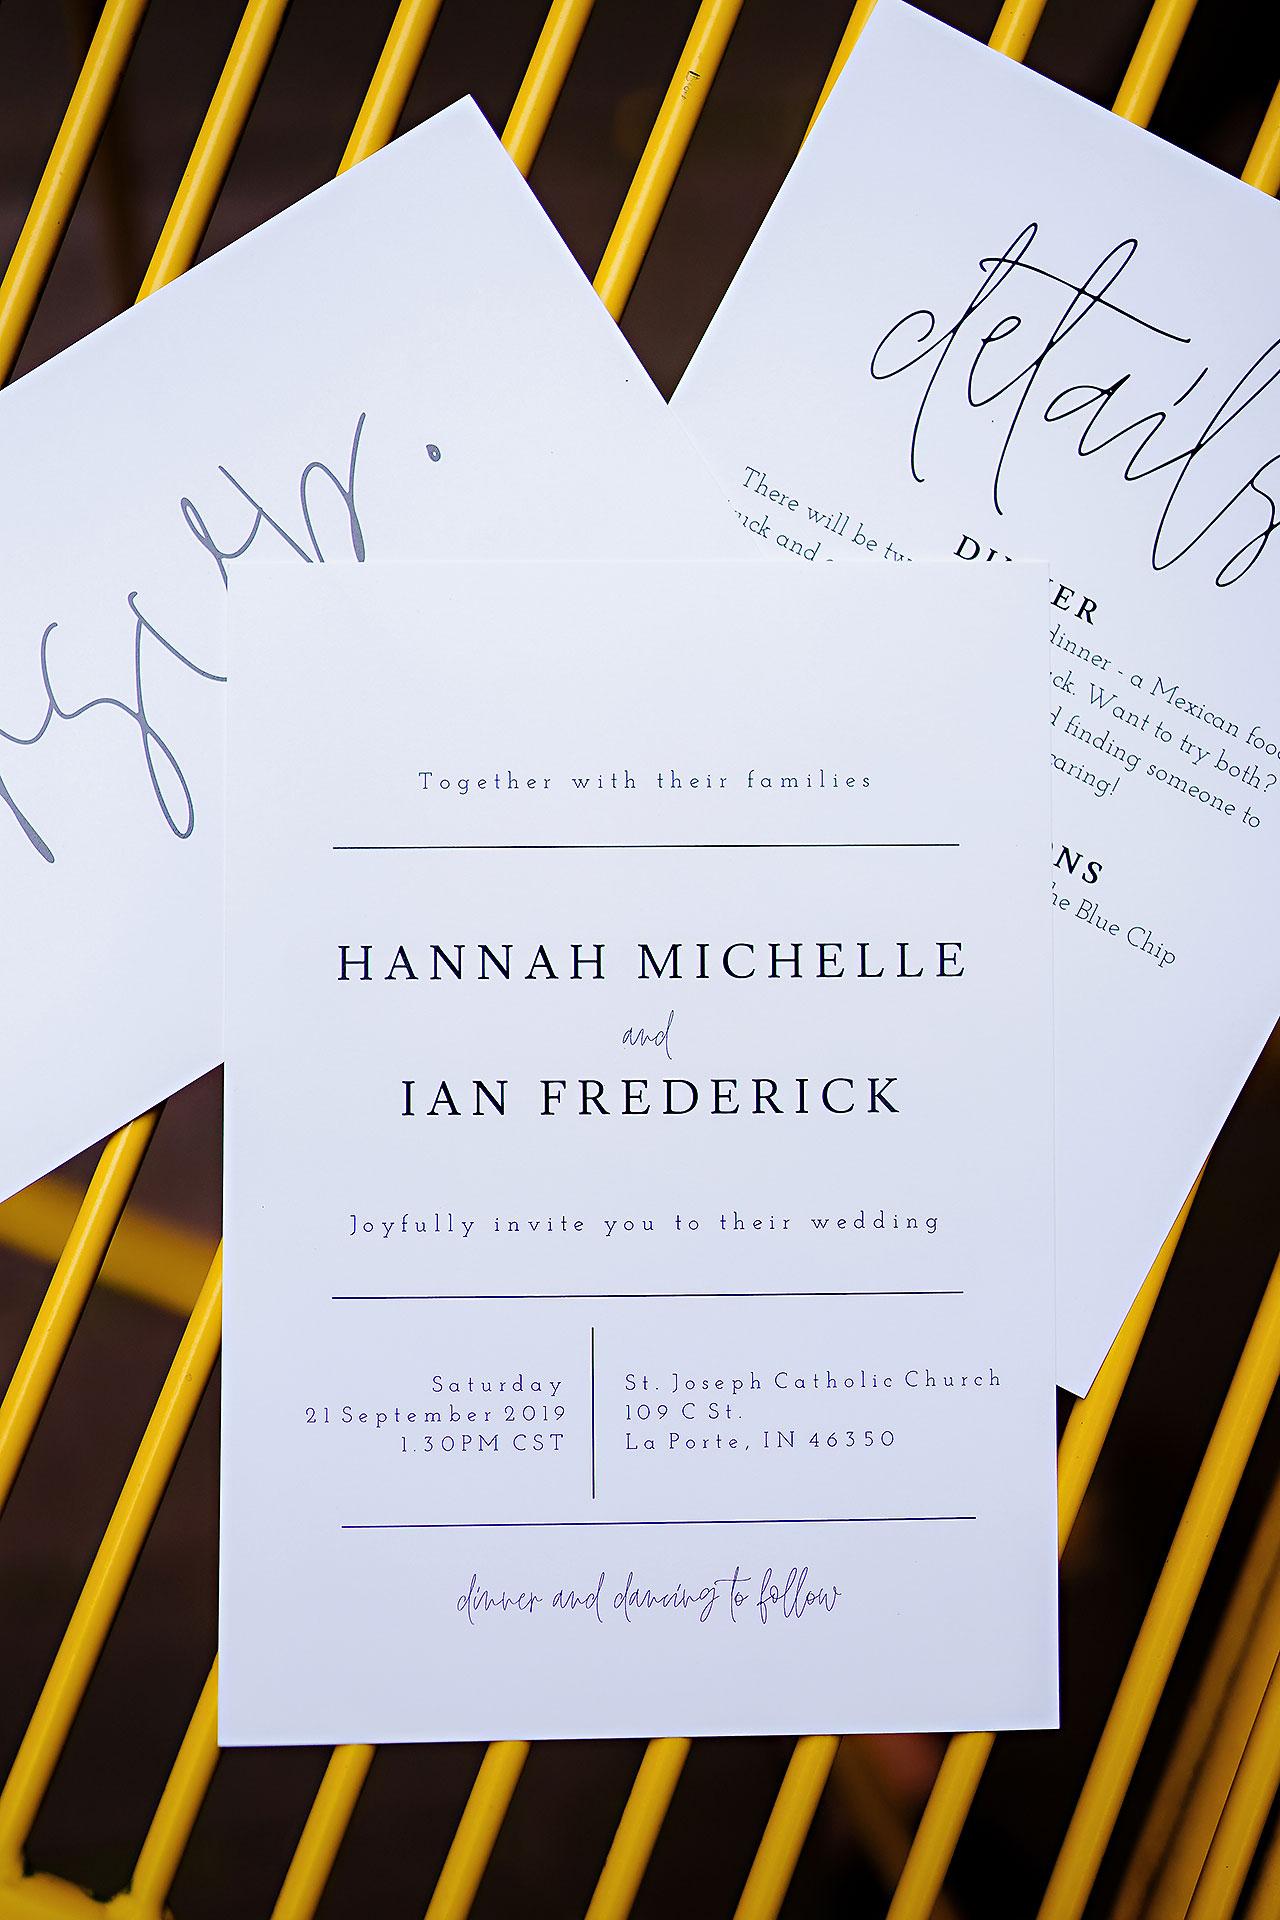 Hannah Ian Friendship Gardens Michigan City Indiana Wedding 001